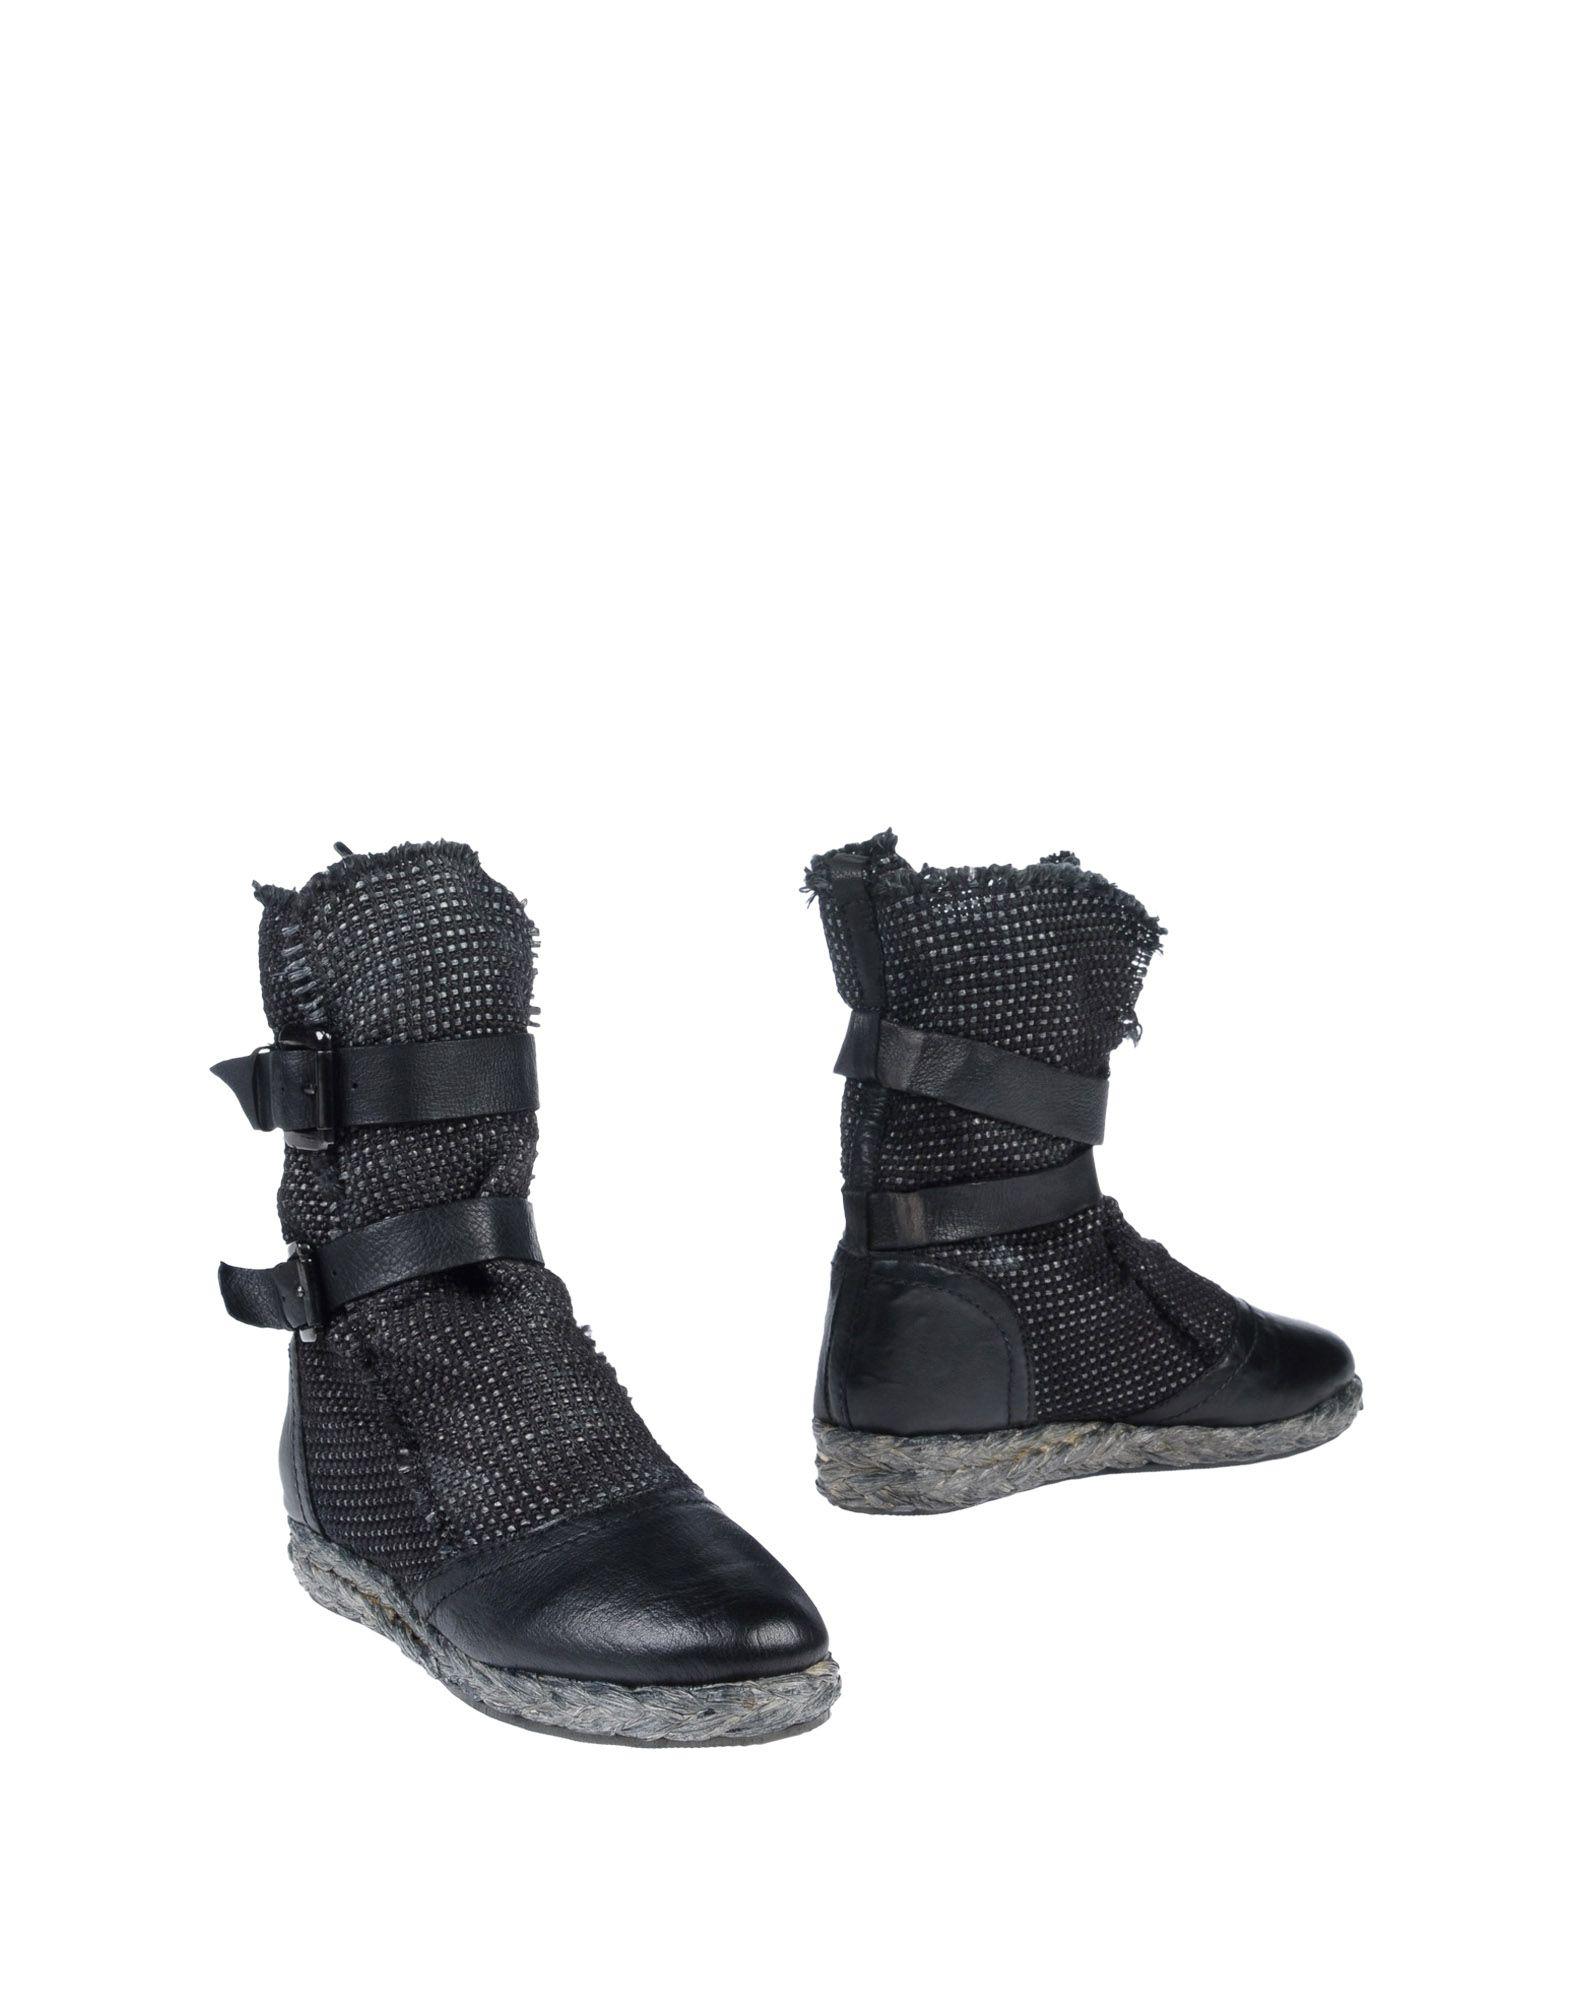 BALDININI TREND Полусапоги и высокие ботинки полусапоги baldinini trend полусапоги